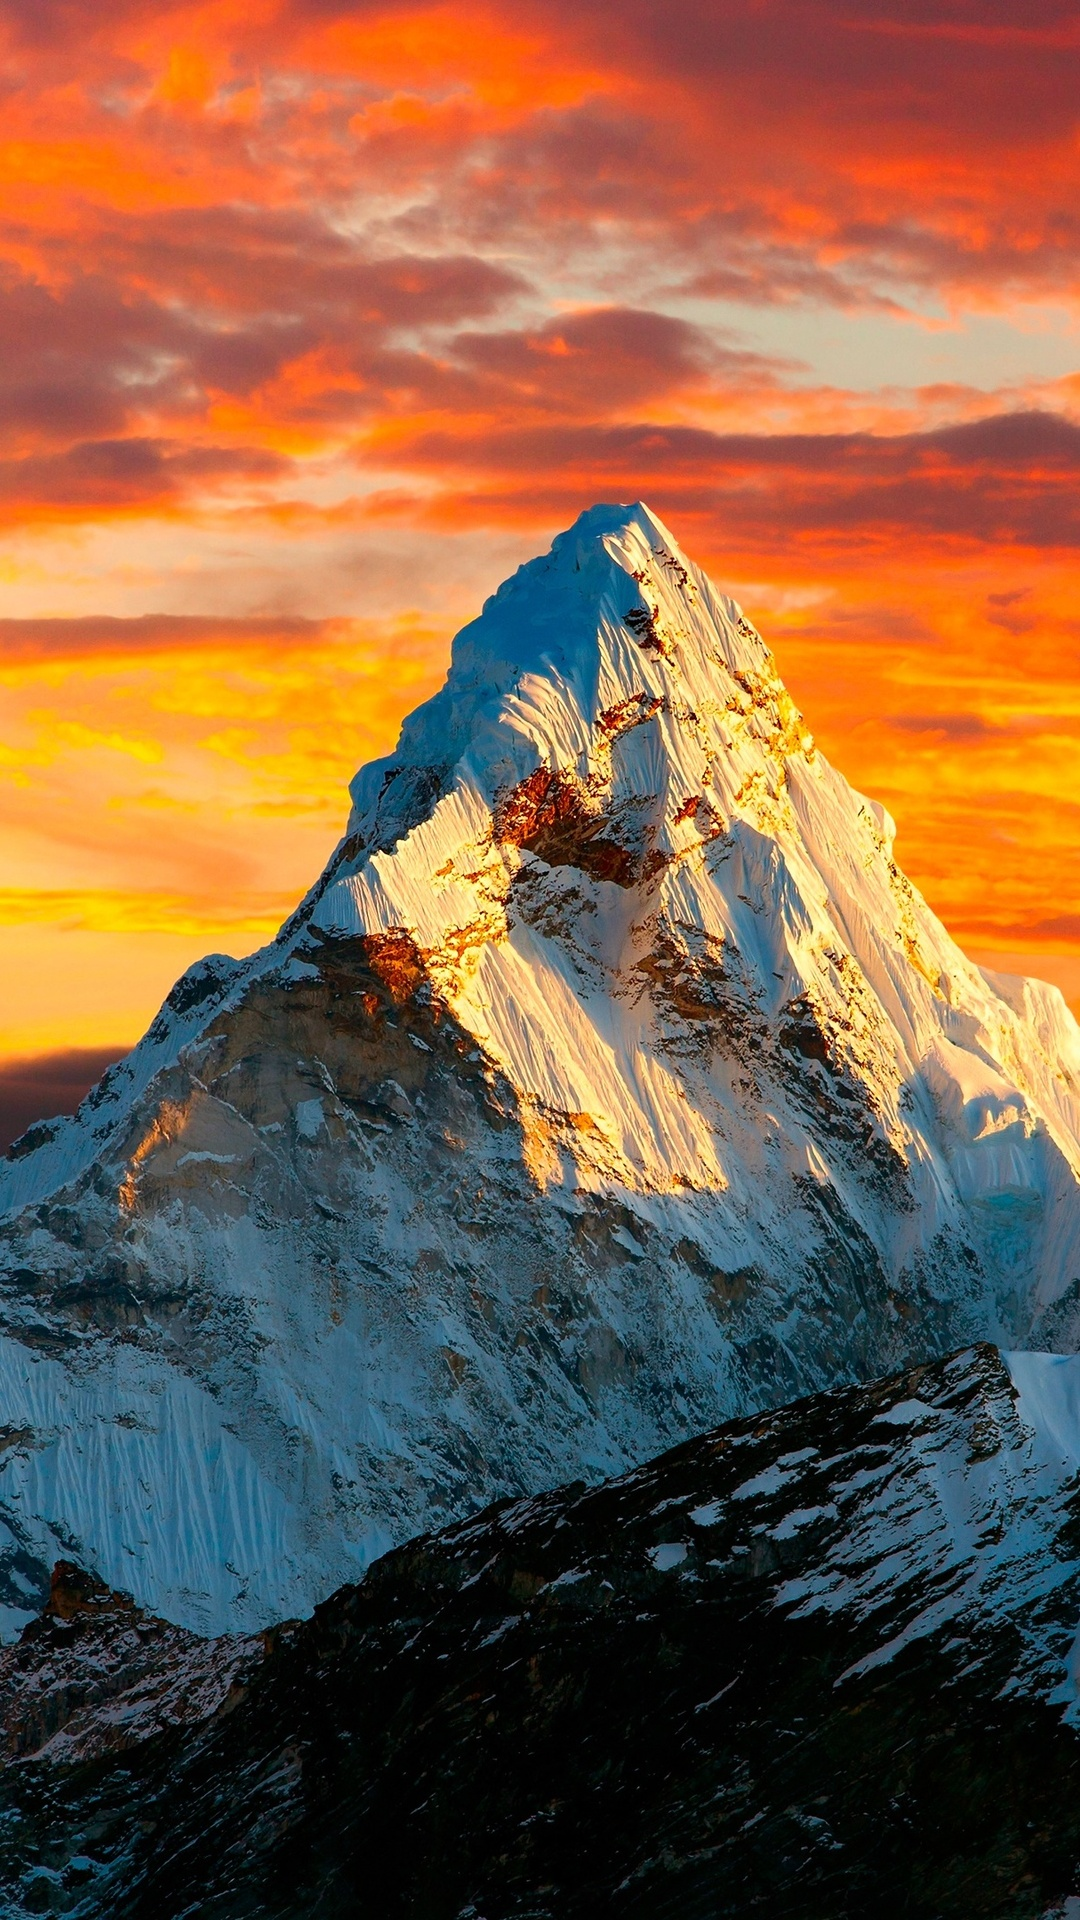 1080x1920 Himalayas Mountains Landscape 4k Iphone 7,6s,6 ...